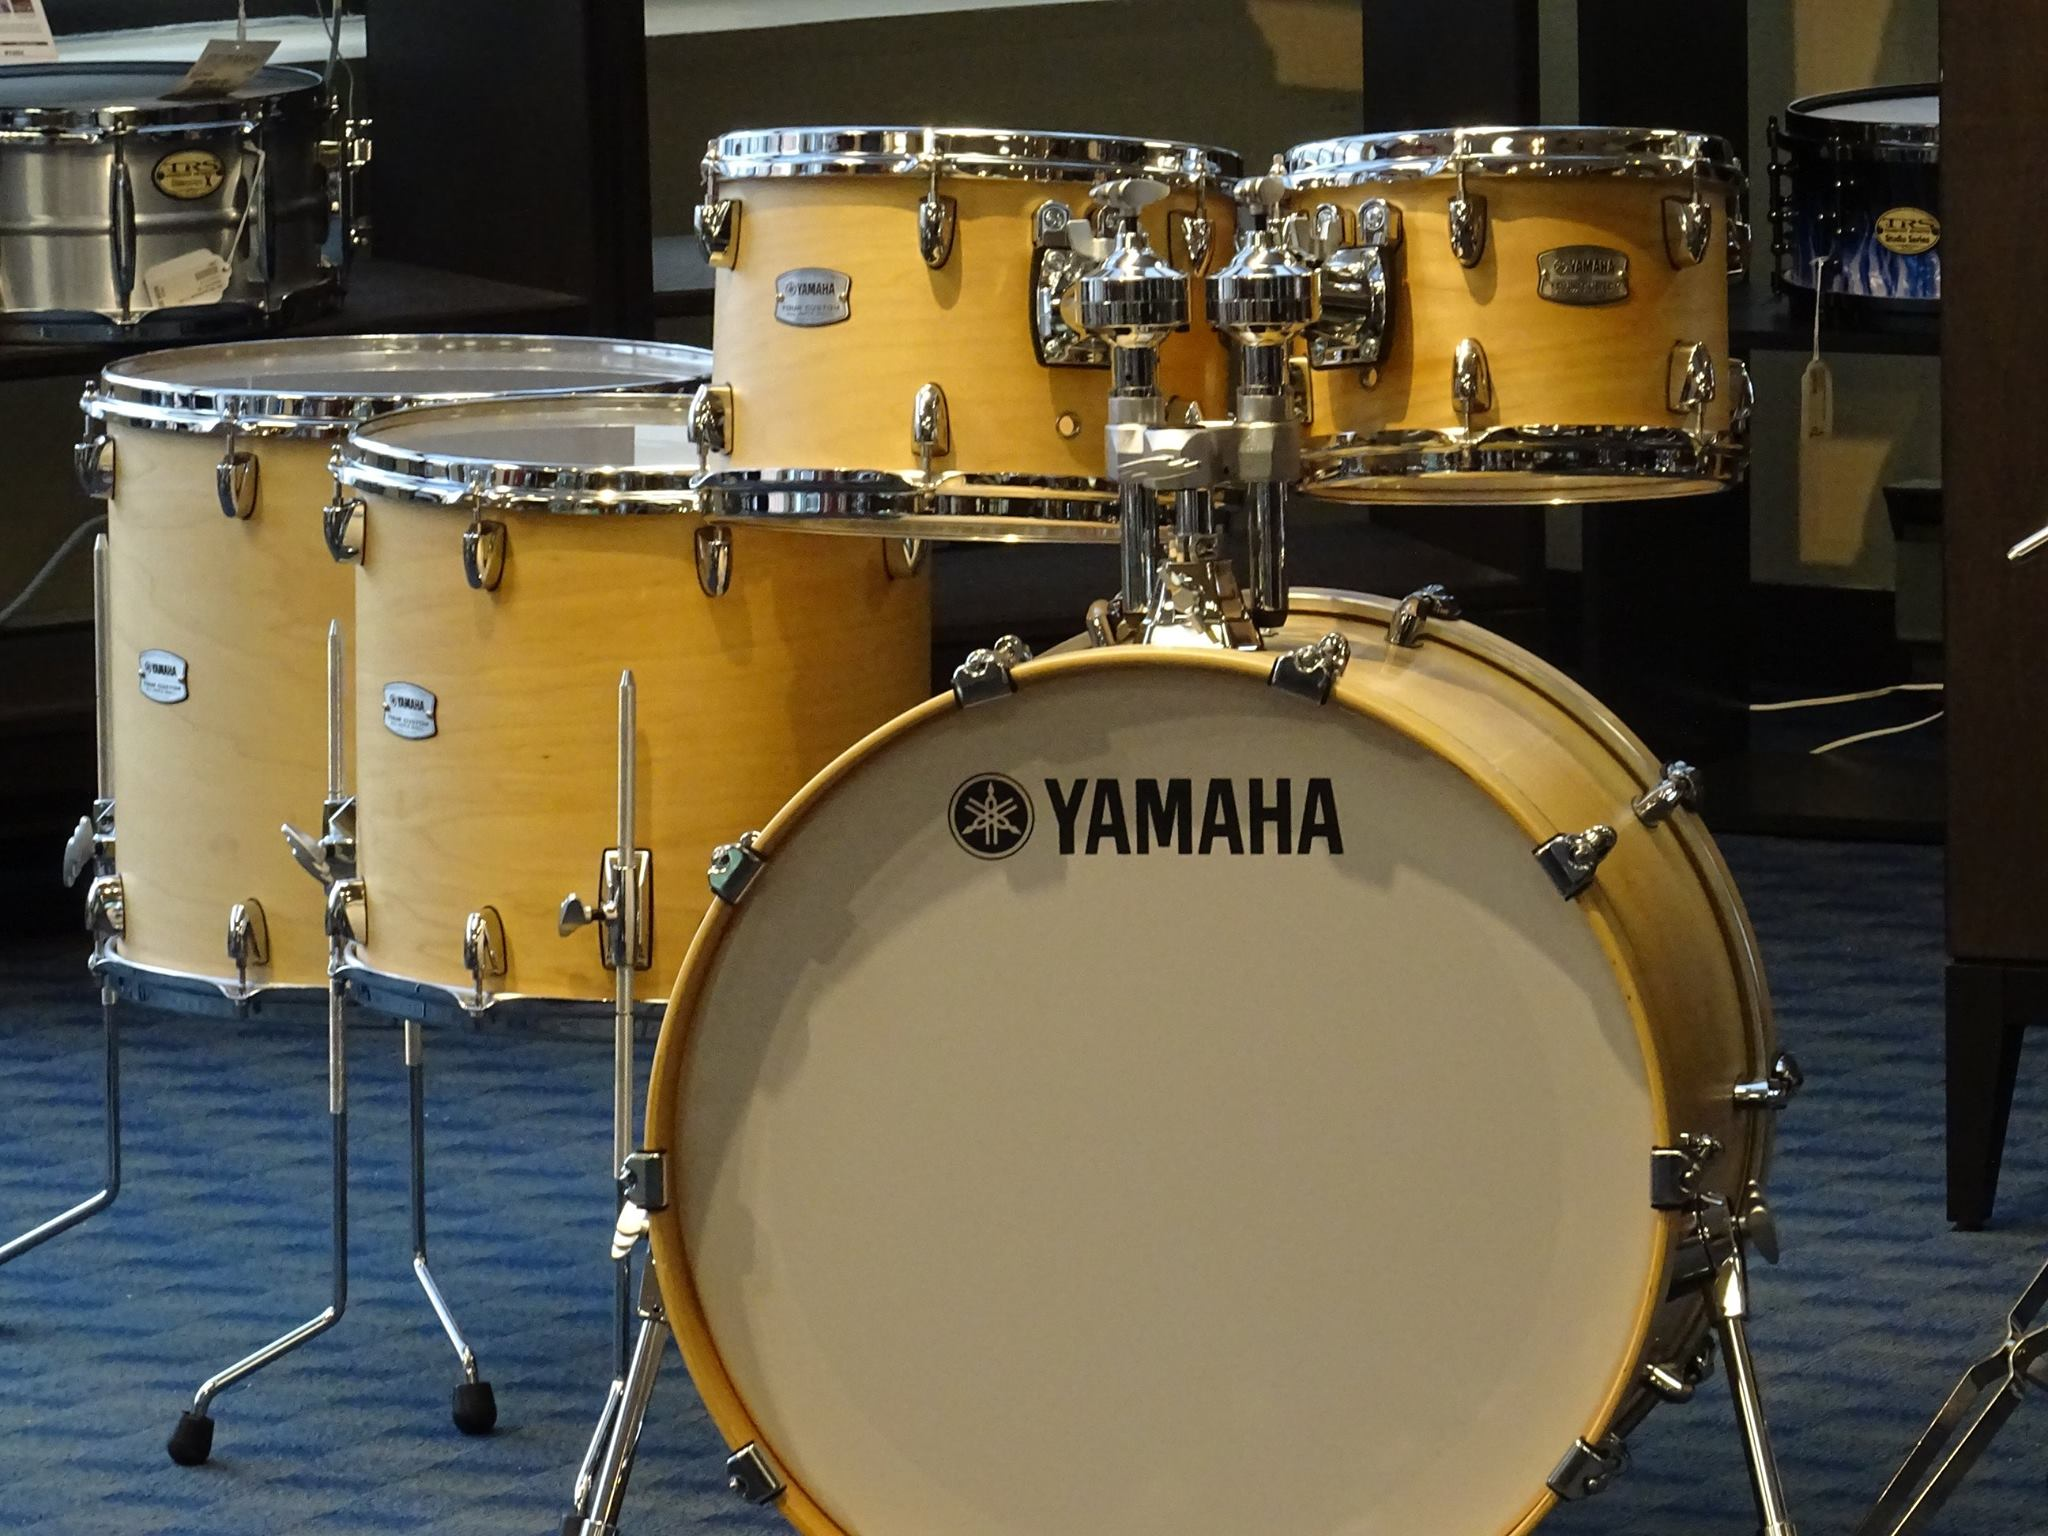 yamaha tour custom 4 pce in butterscotch finish drummer. Black Bedroom Furniture Sets. Home Design Ideas